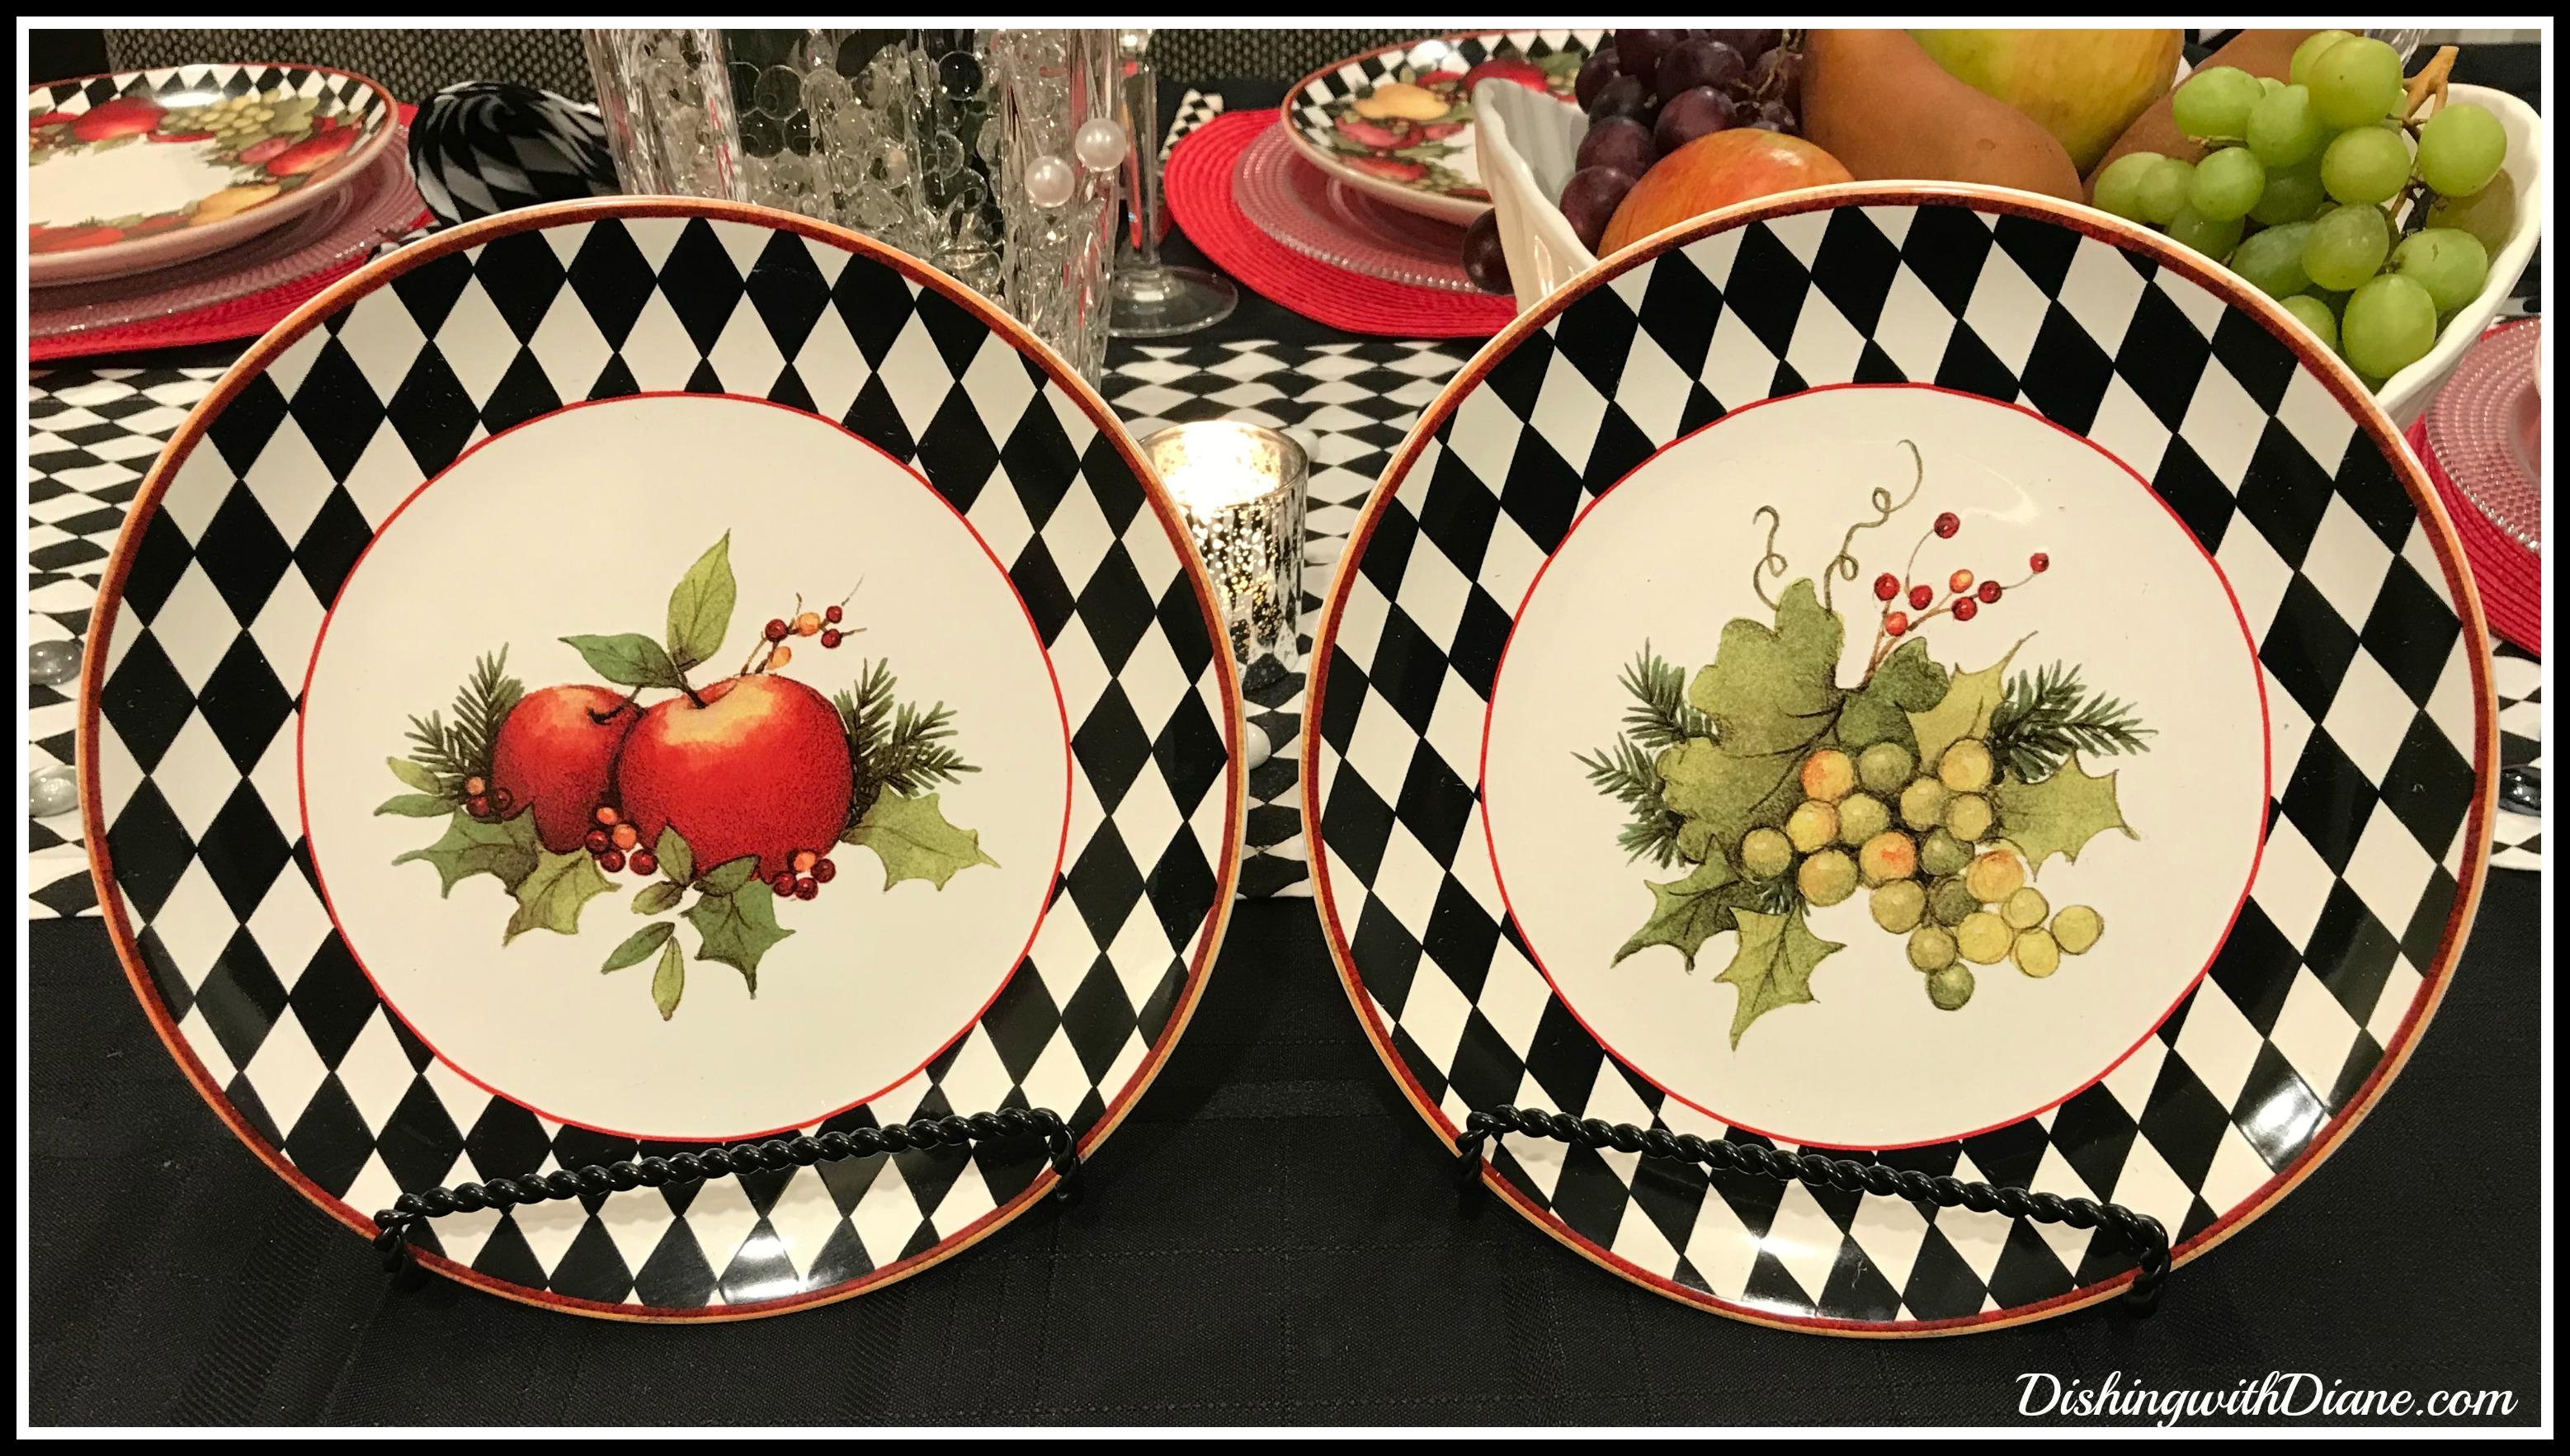 photo jan 25, 11 48 29 pm (1) salad plate one